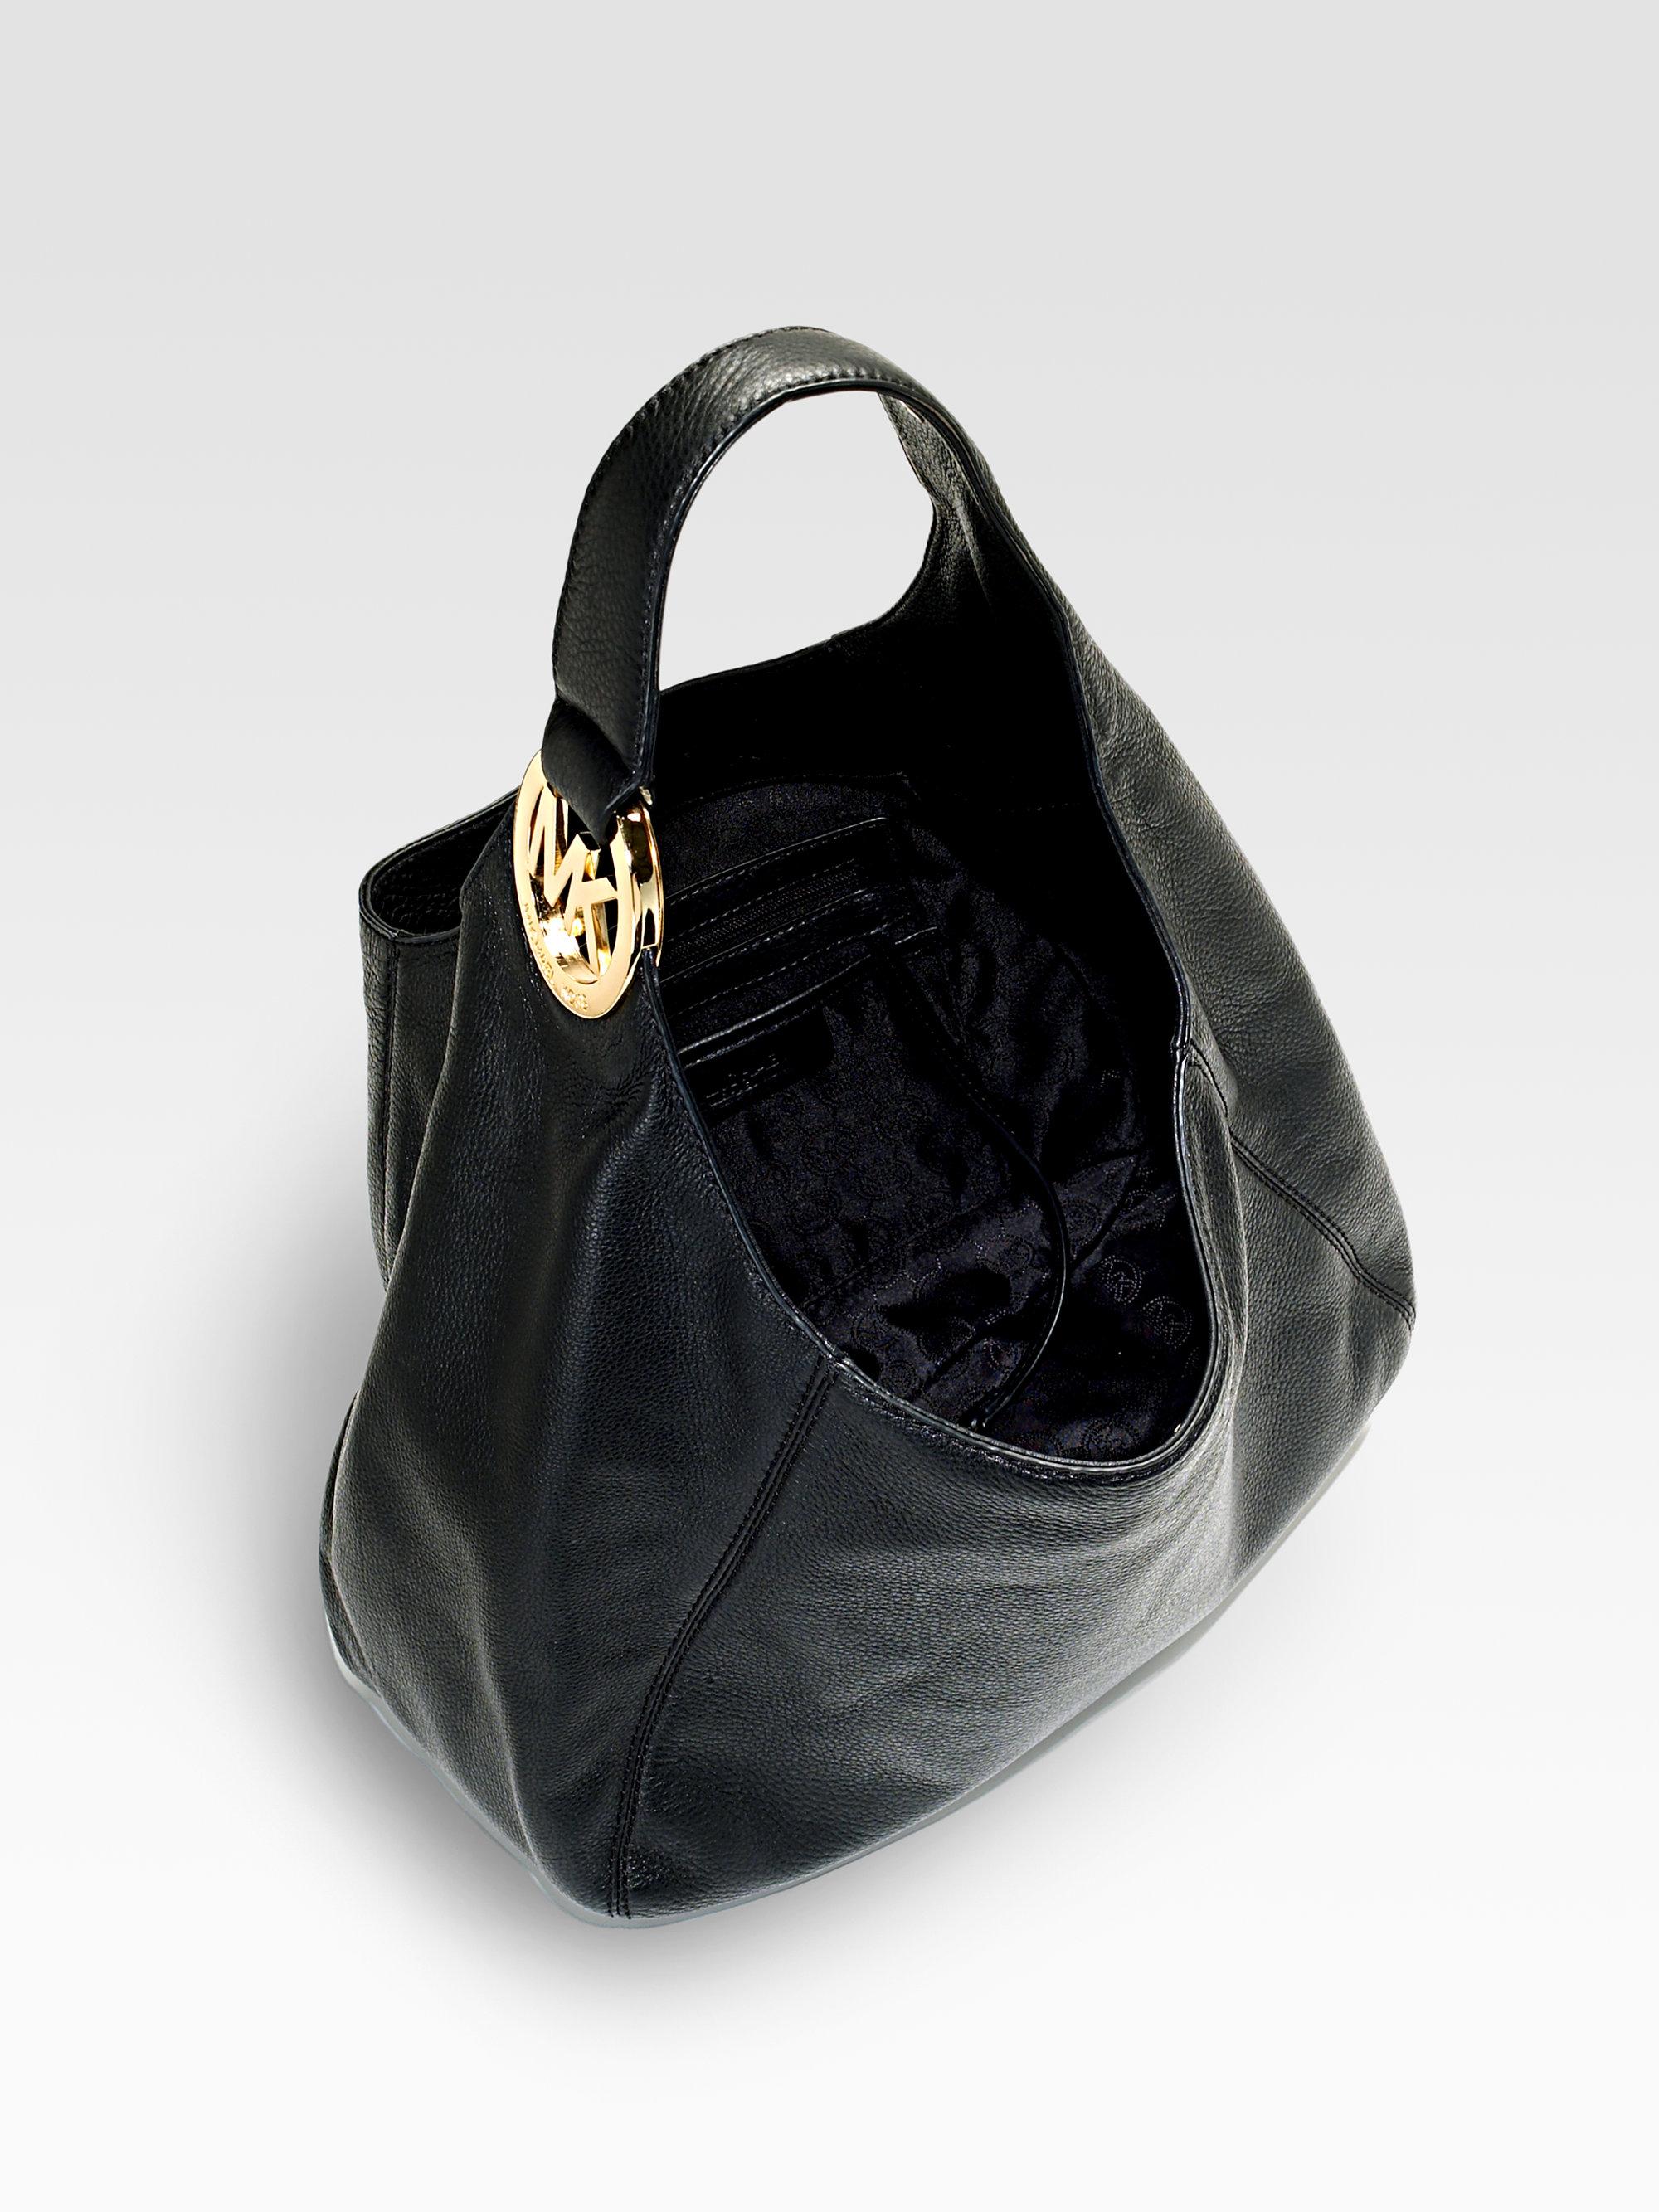 8fc1fa29ac2b ... germany lyst michael michael kors fulton large shoulder bag in black  8d563 e2581